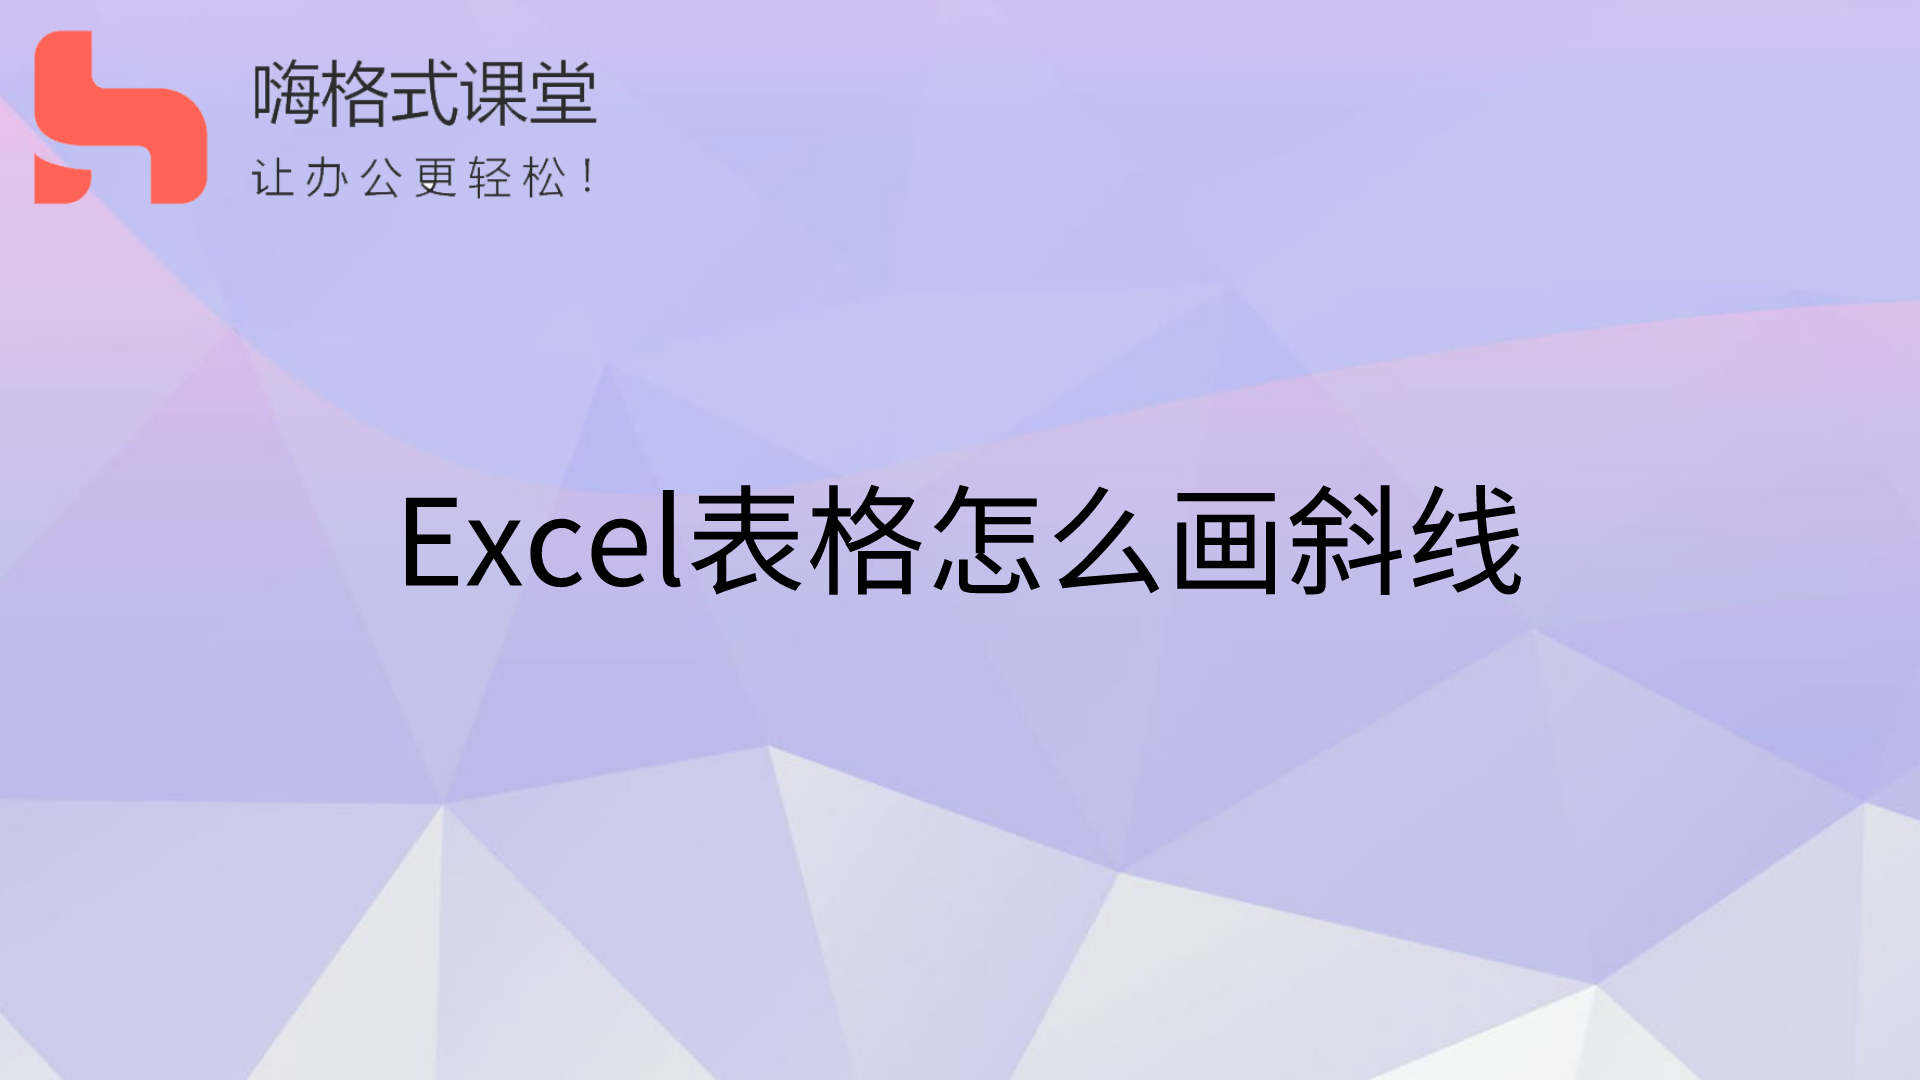 Excel表格怎么画斜线s